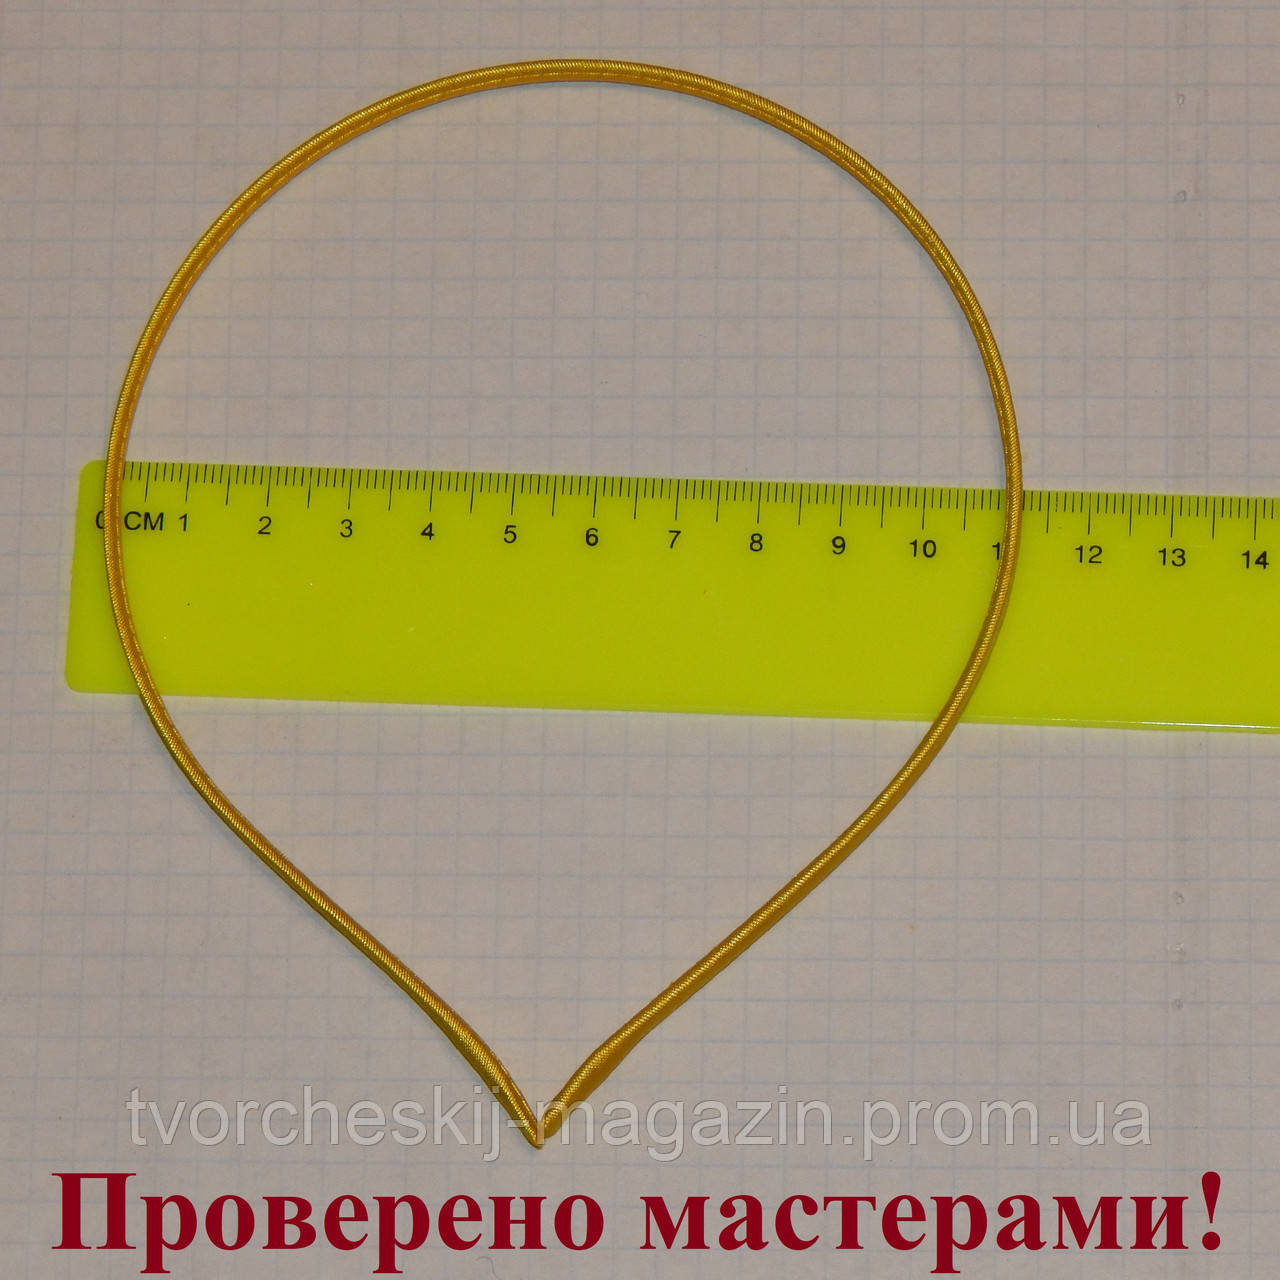 Ободок металлический в ткани 5 мм желтый